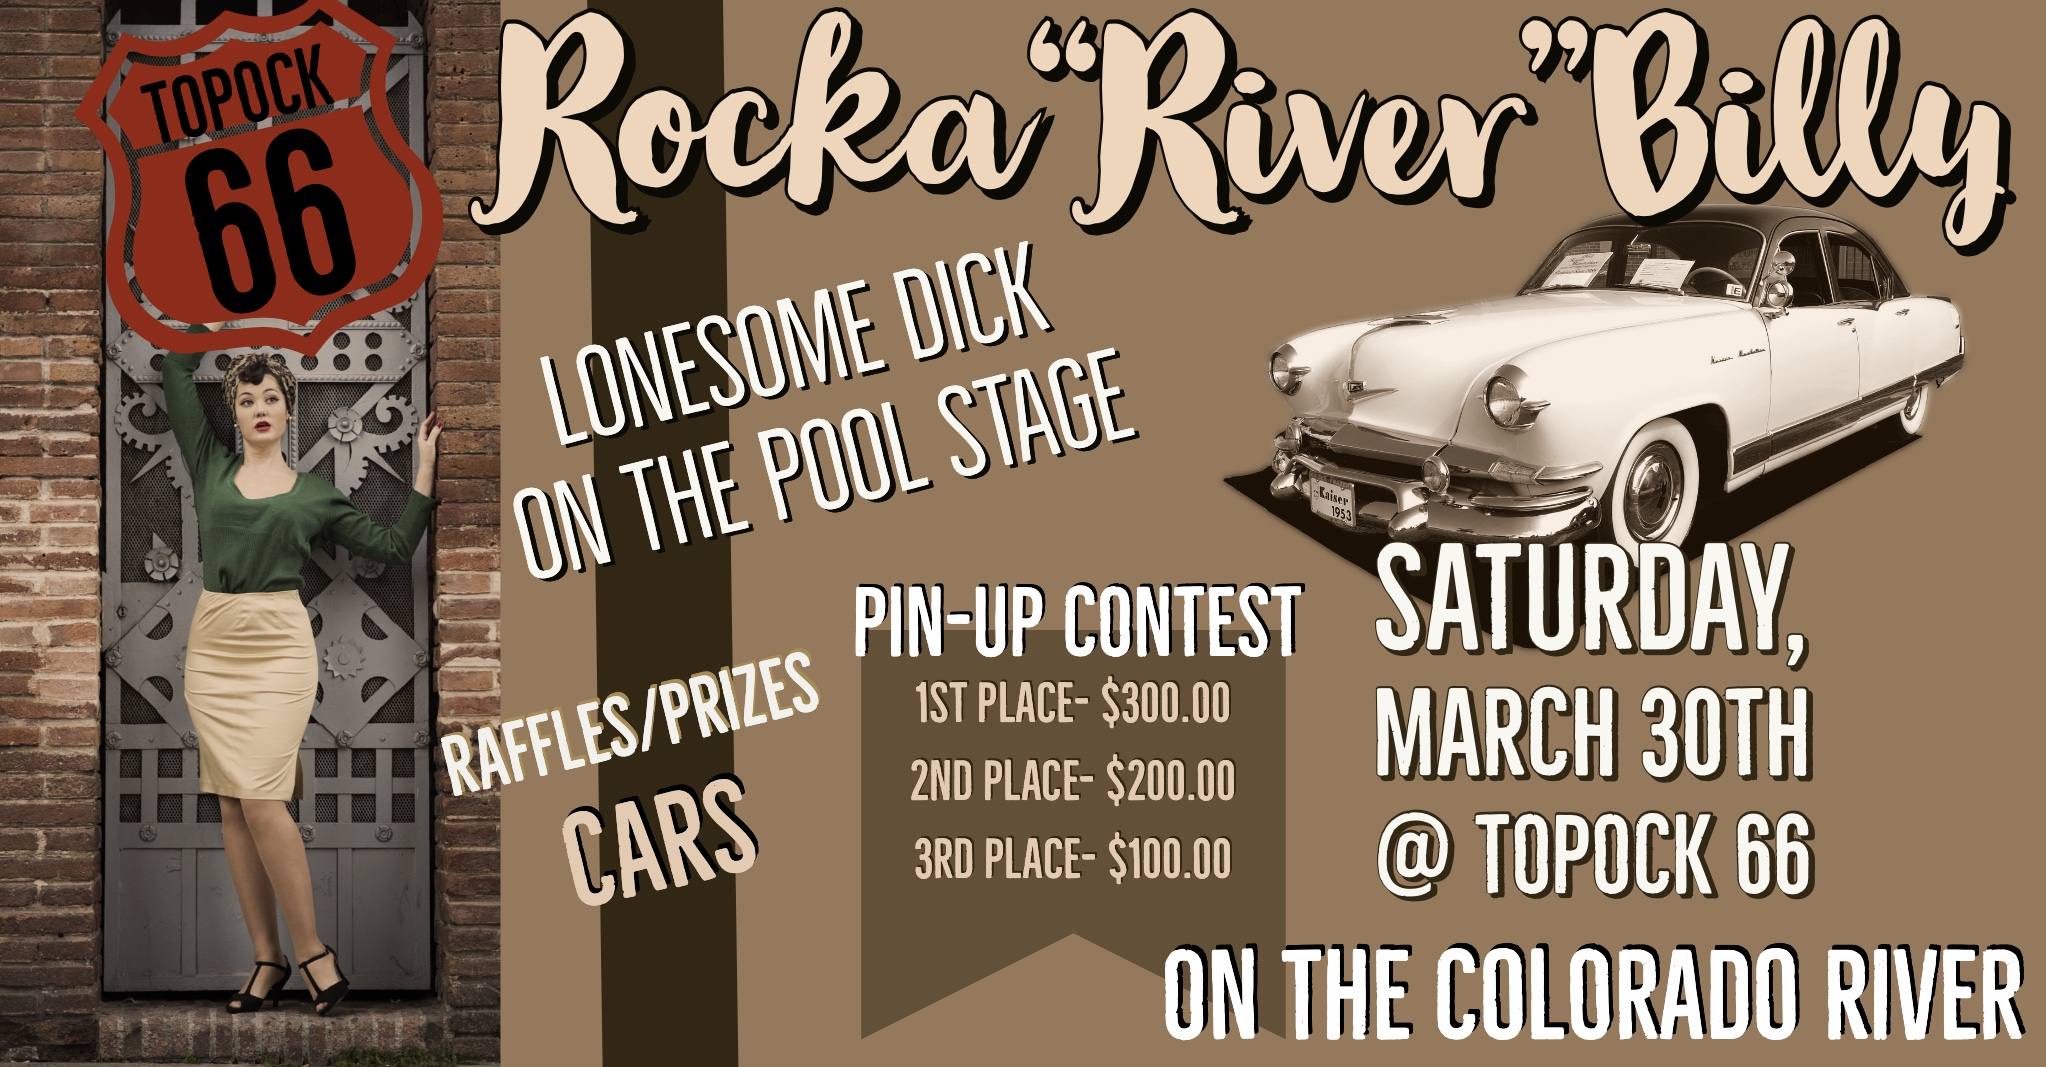 Topock 66 Rocka River Billy